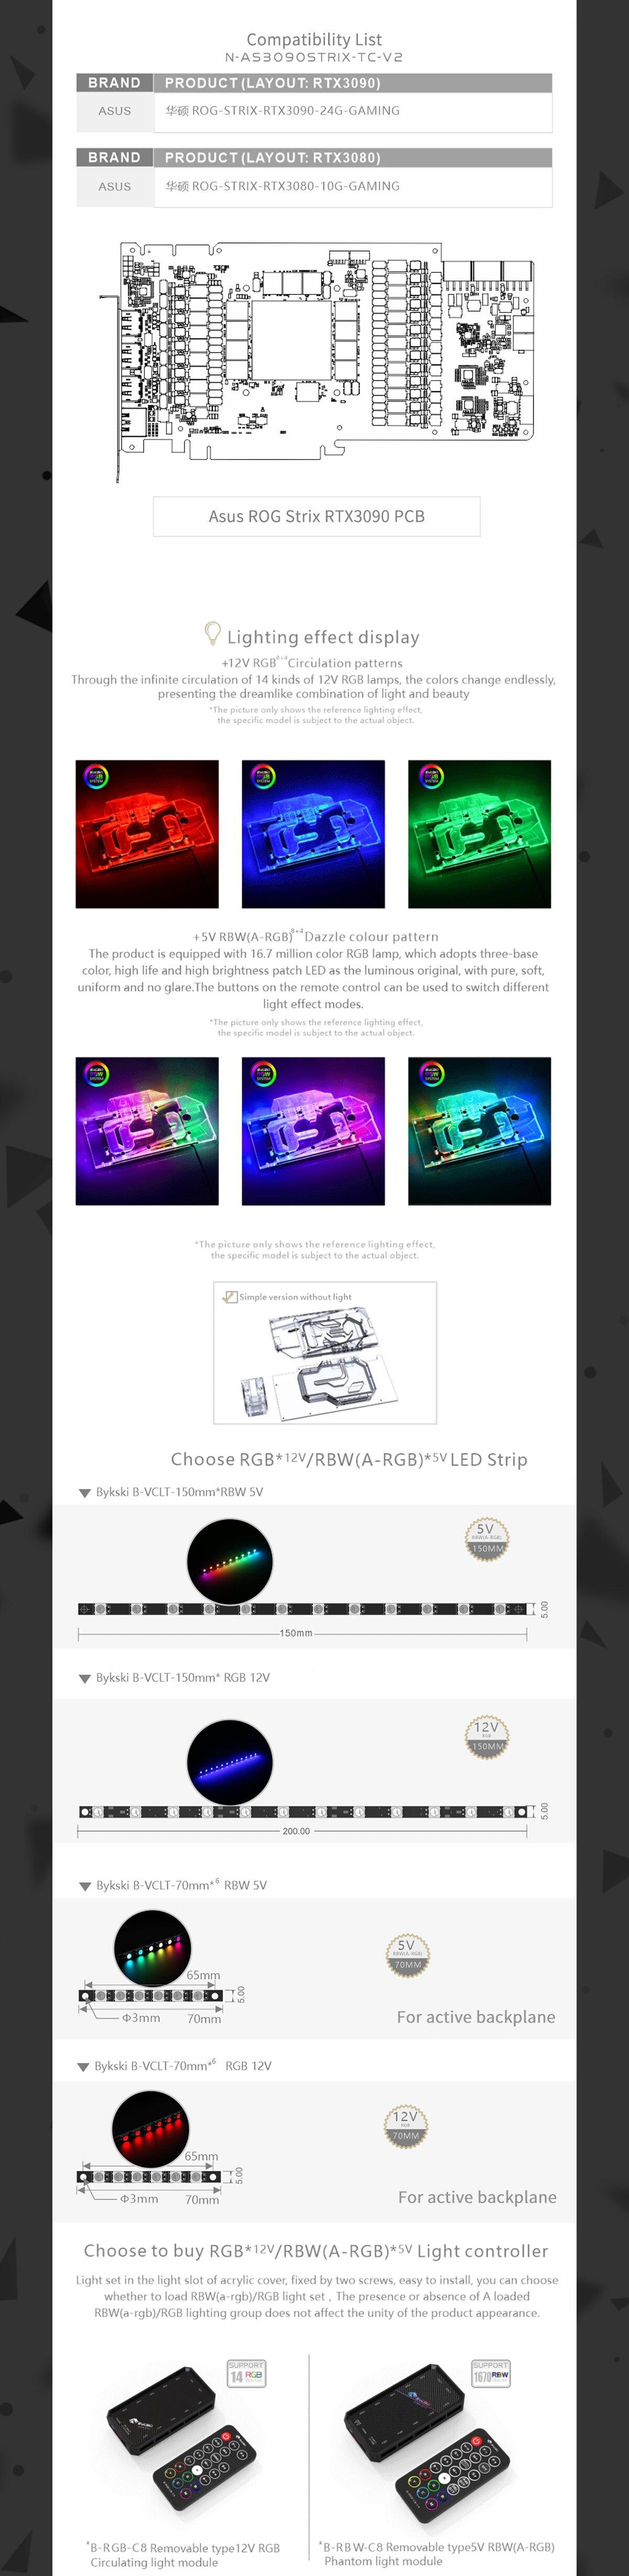 Bykski GPU Block With Active Waterway Backplane Cooler For ASUS ROG STRIX RTX 3090 3080 Gaming , N-AS3090STRIX-TC-V2